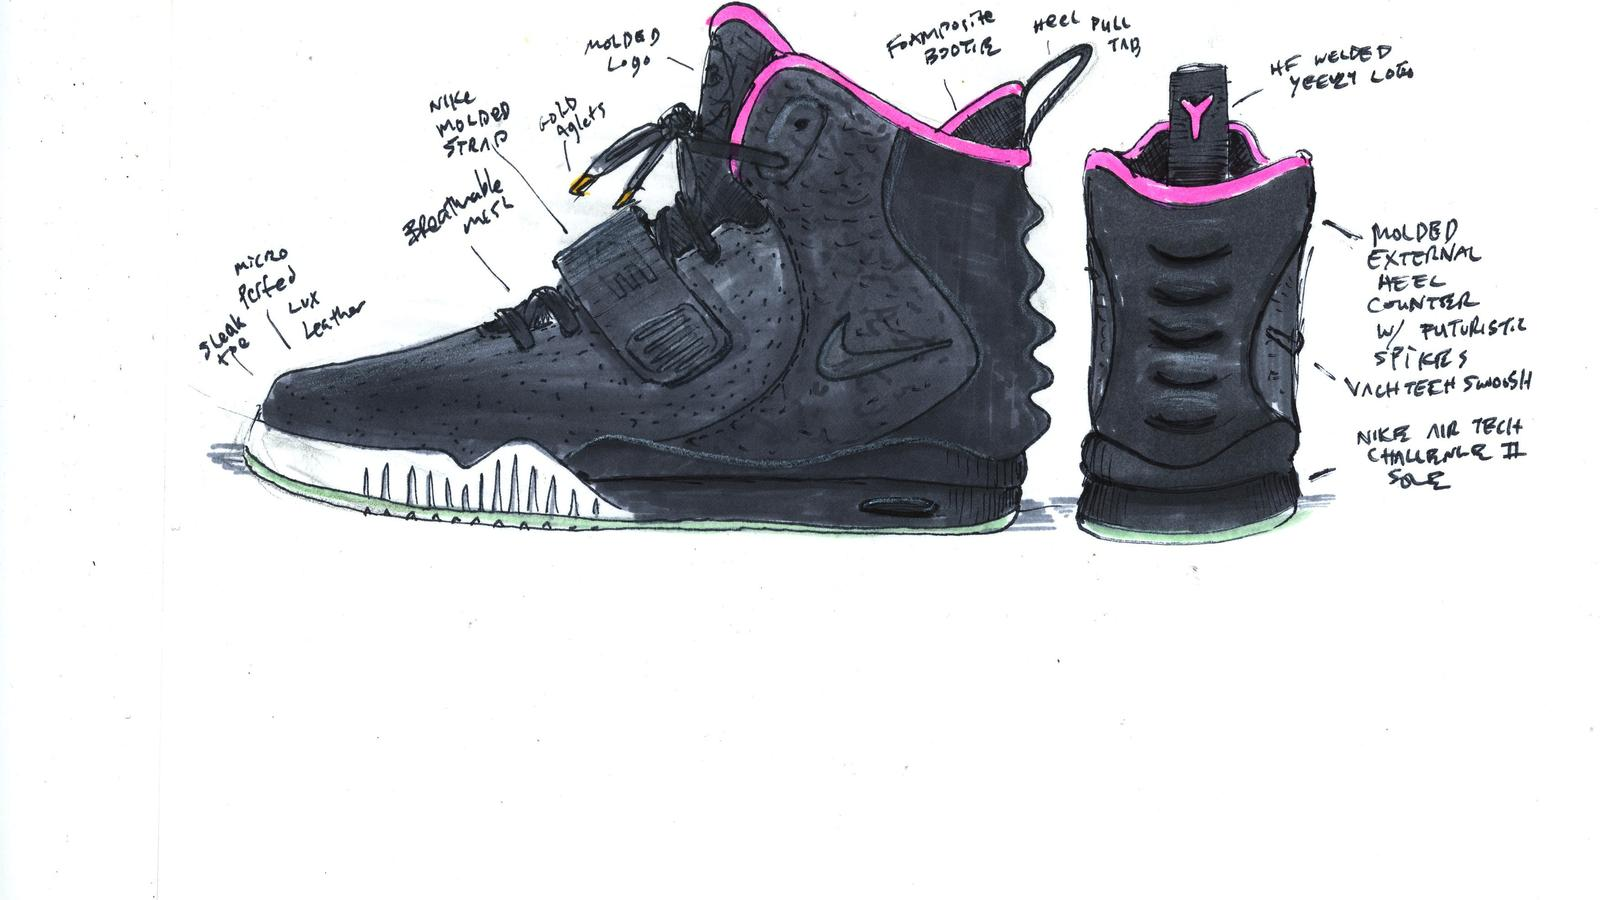 hot sale online 87f74 8bf17 NikeAirYeezyIISketch. NikeAirYeezyIIBack.  NikeAirYeezyIIDetail3. NikeAirYeezyIIDetail4.  NikeAirYeezyIIDetail